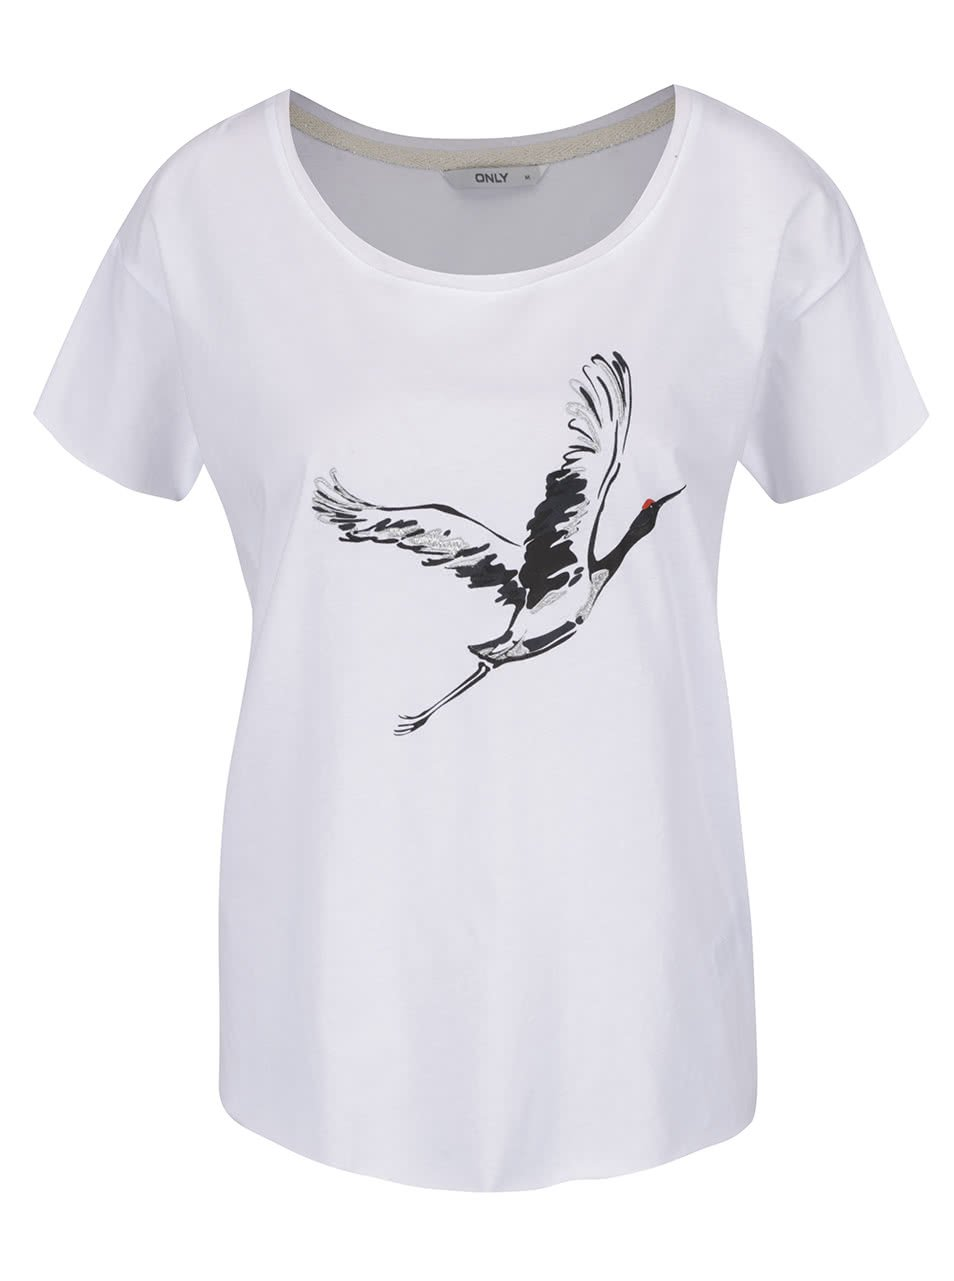 Bílé tričko s potiskem ONLY Draw Big Crane